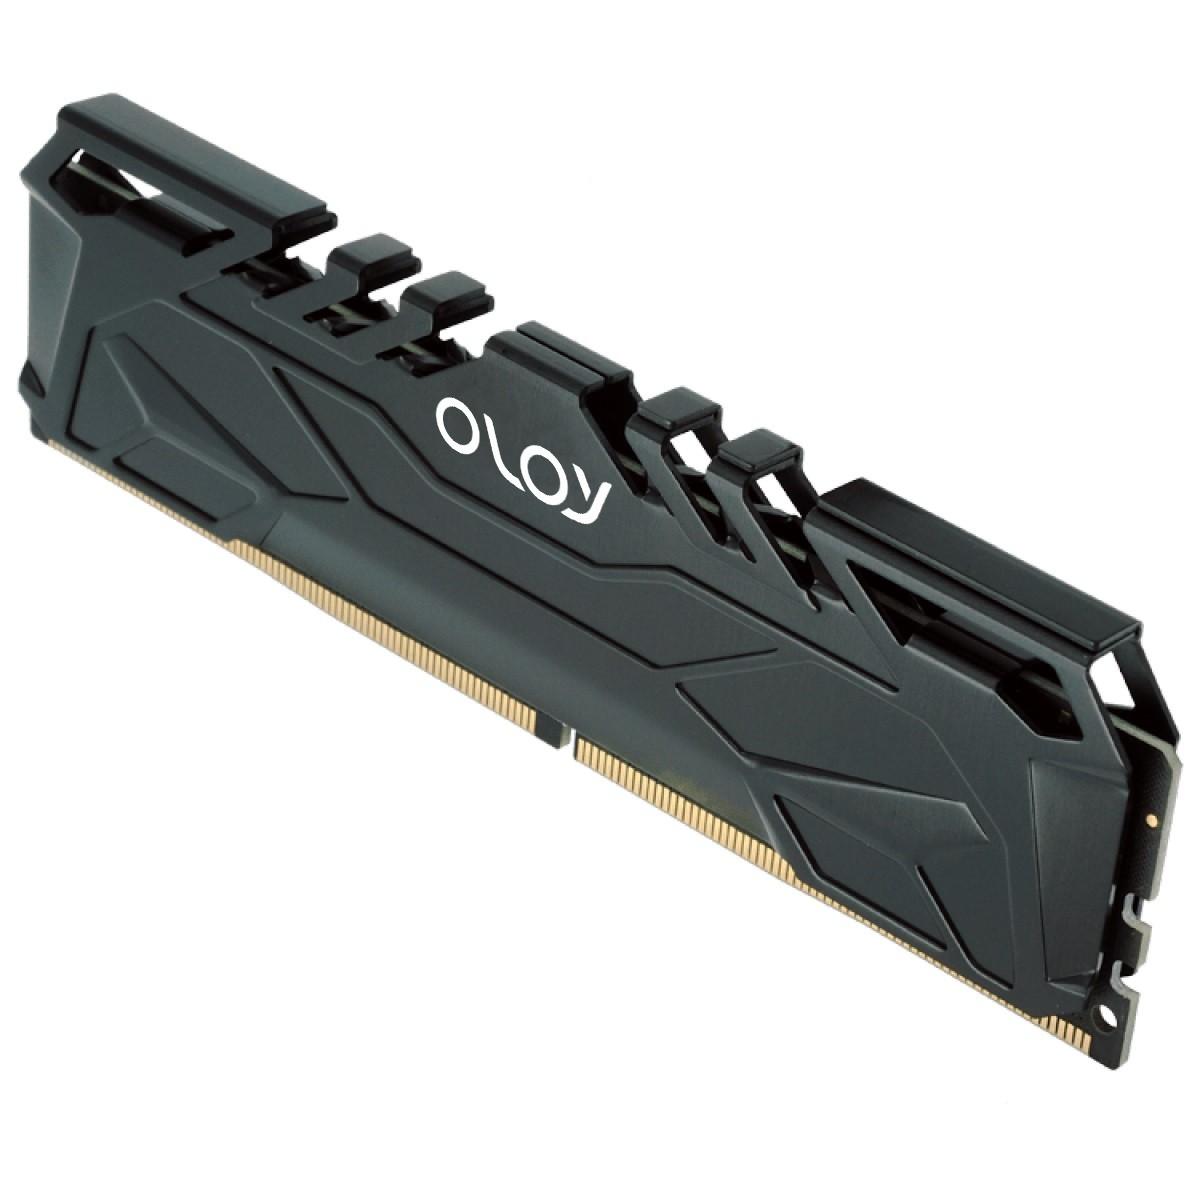 Memória DDR4 OLOy Owl Black, 16GB (2x8GB), 2666MHz, Black, MD4U082619BJDA - IMP